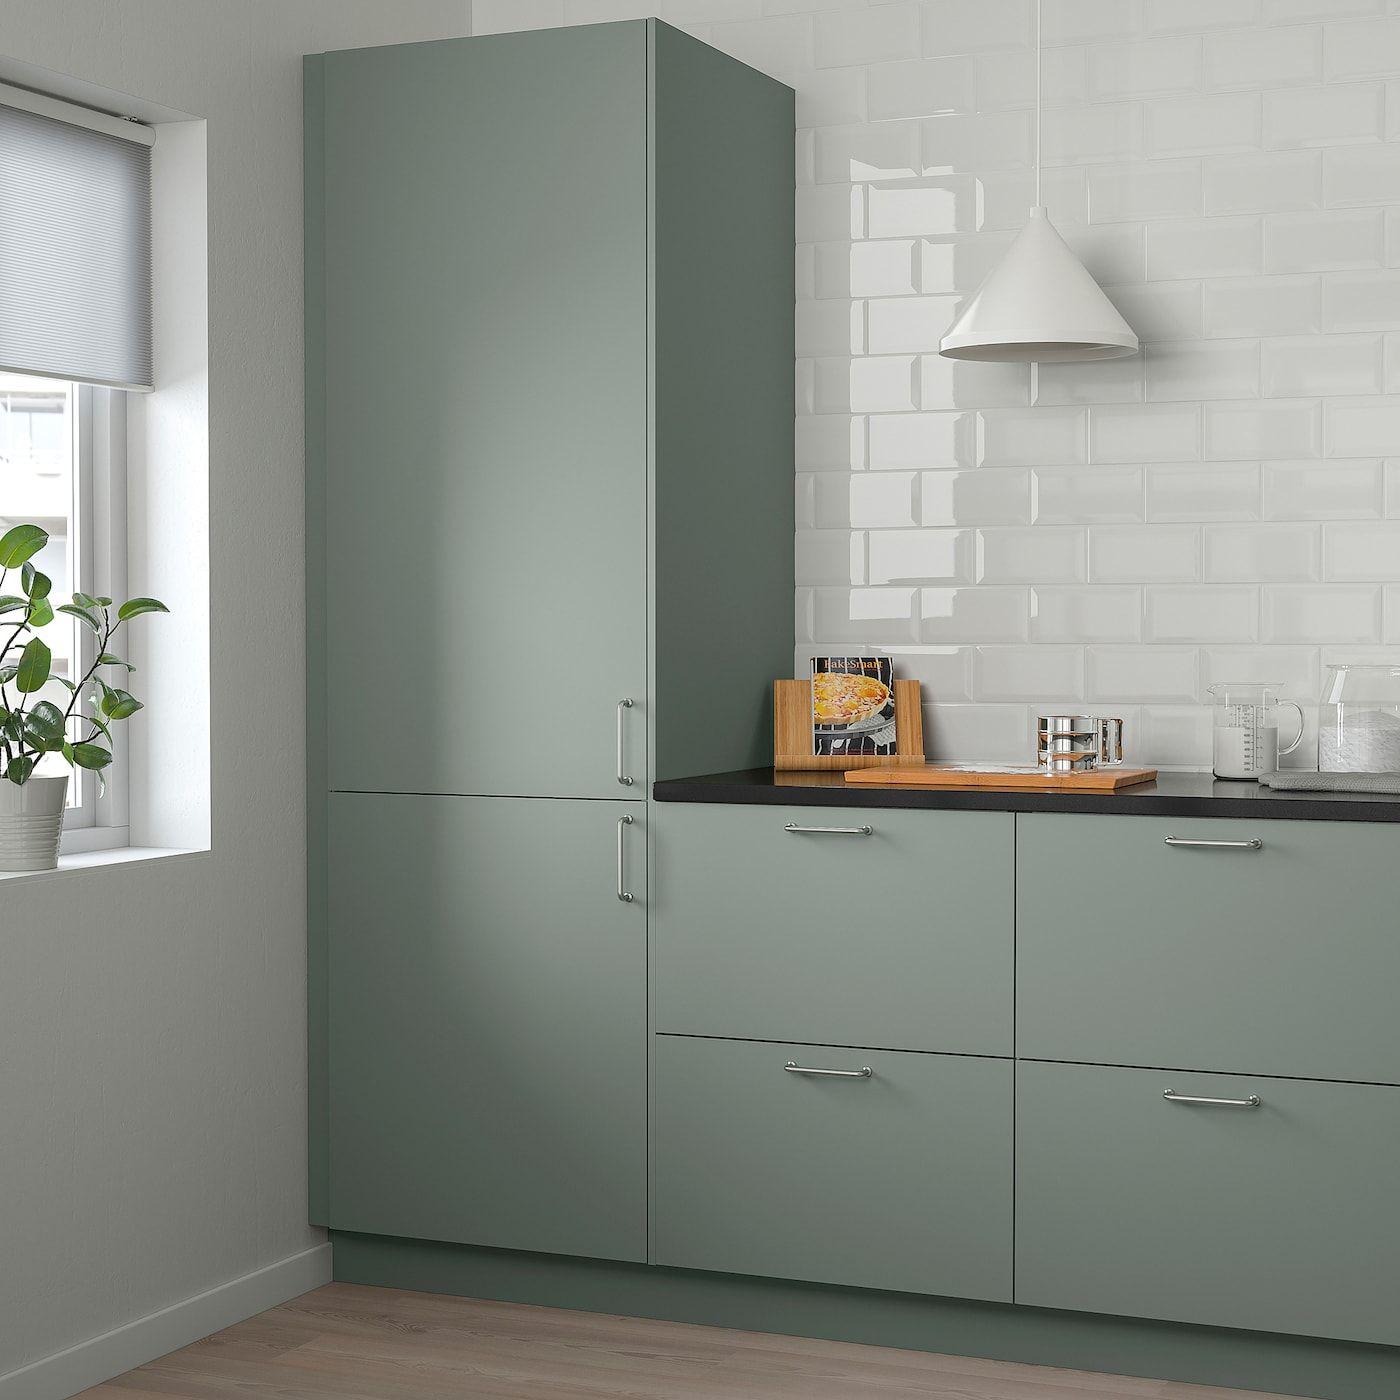 Bodarp Door Gray Green 24x30 61x76 Cm Ikea In 2021 Green Kitchen Cabinets Ikea Kitchen Ikea